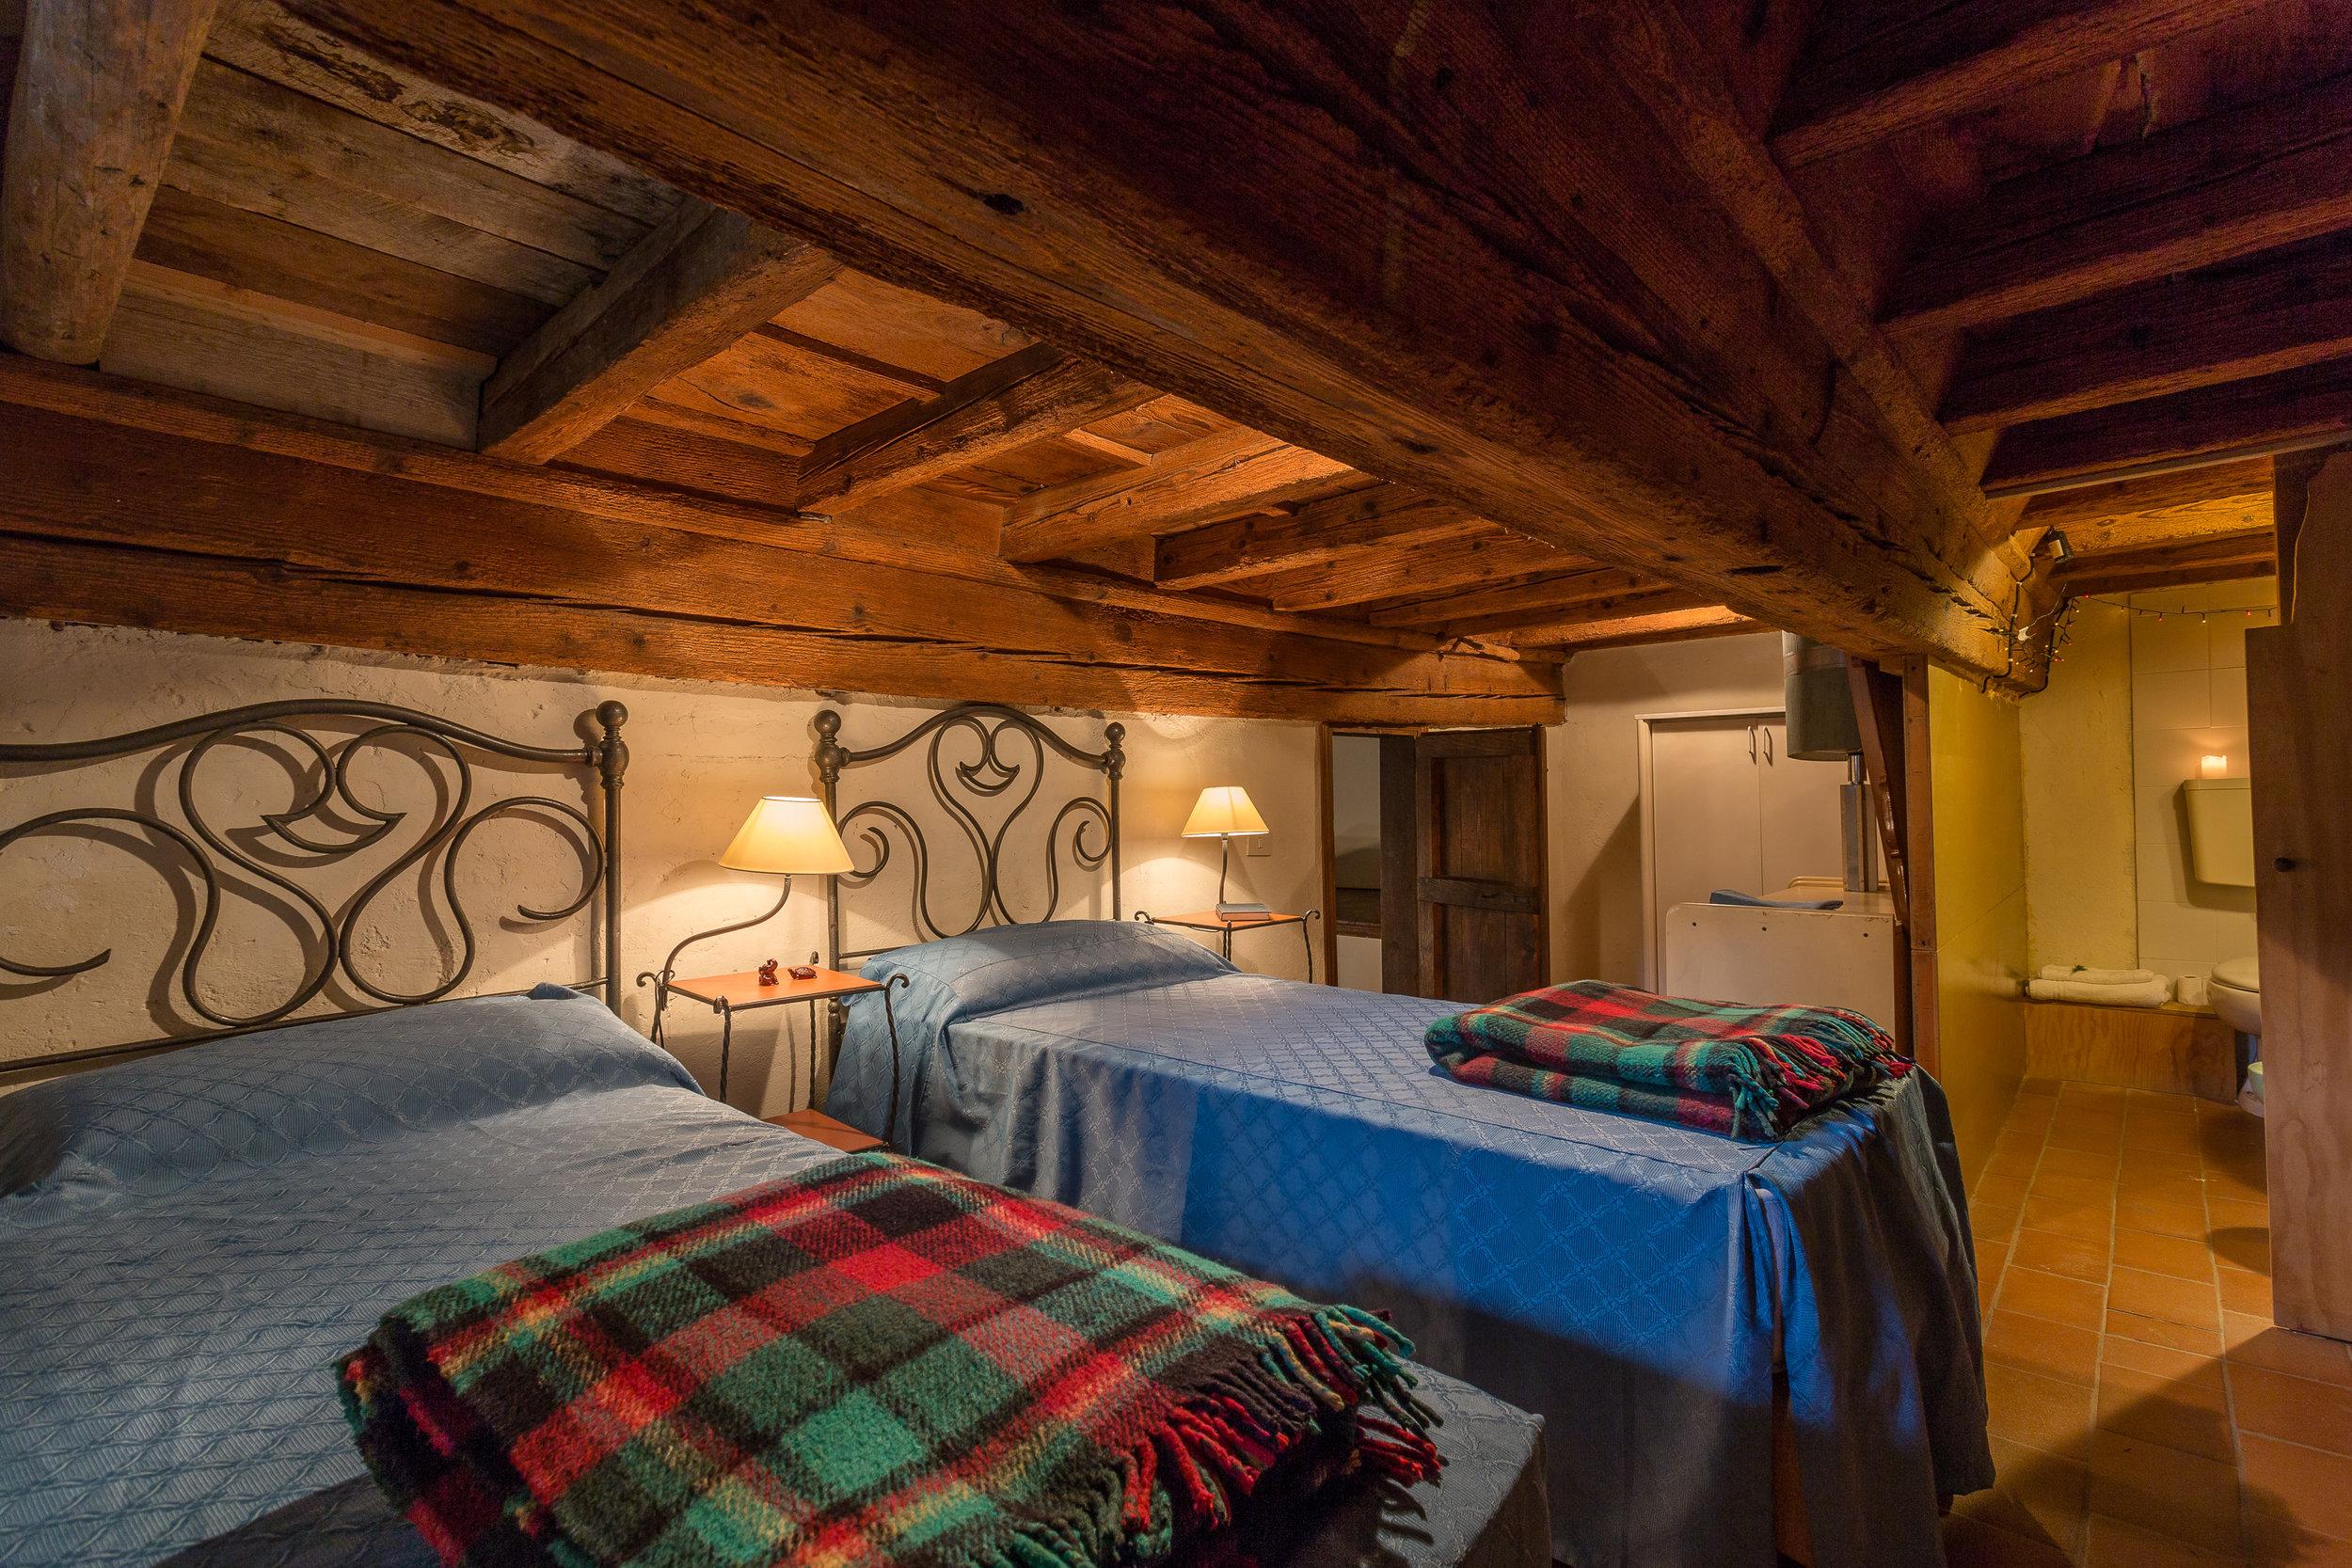 Castello 10 Loft Bedroom (2 bedroom, 1.5 bathroom apartment. This bedroom is great for kids, or short people. Nicknamed, 'The Hobbit Room')